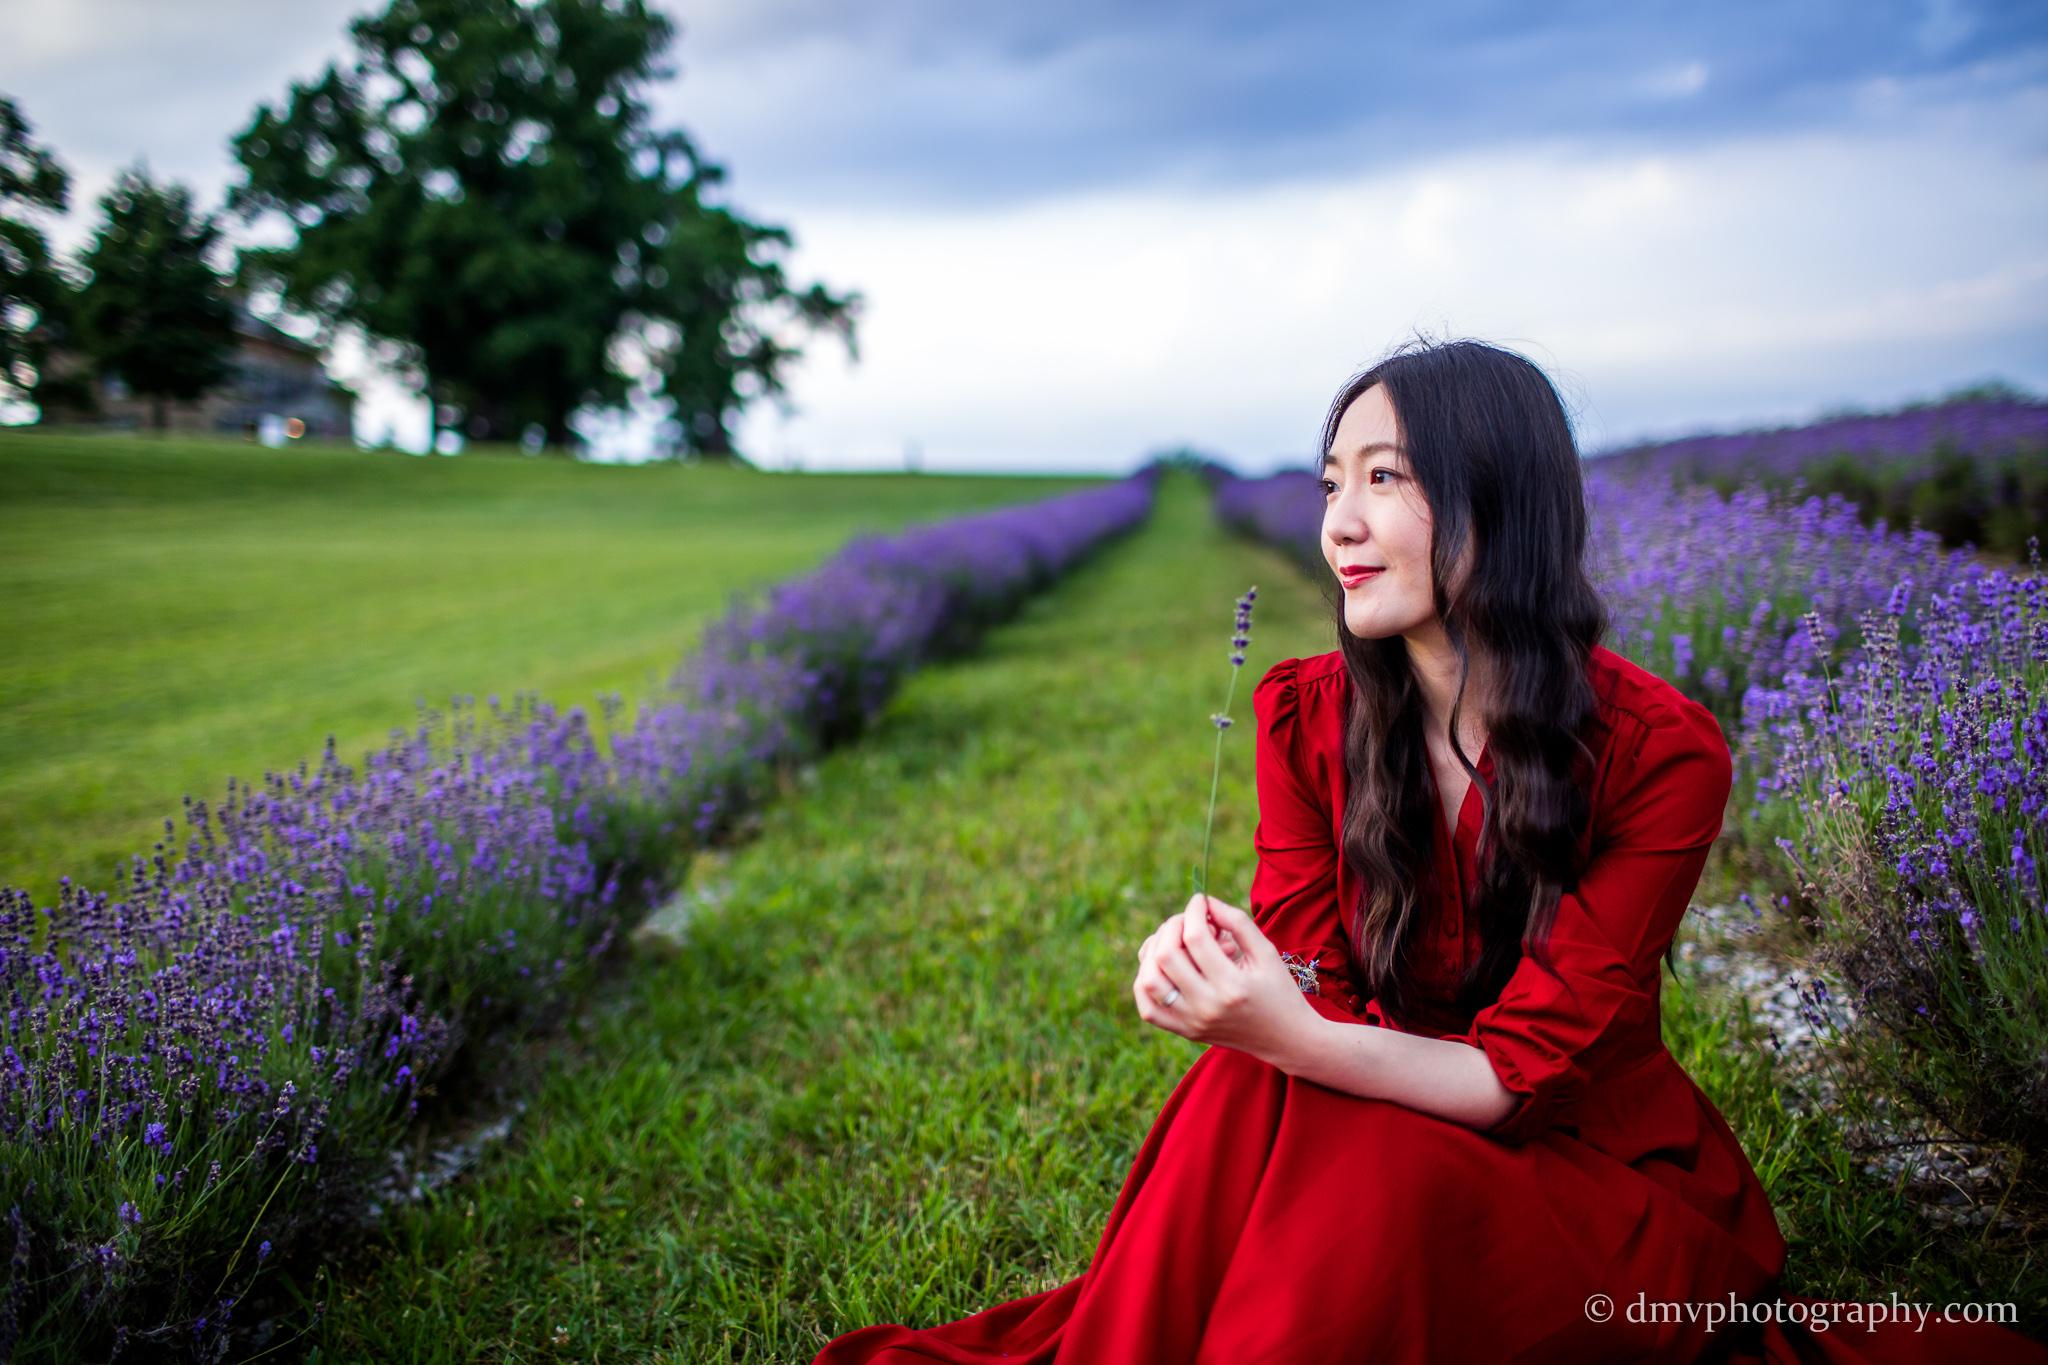 2016-06-24 - Zhu Xing - Lavender Field - 00032